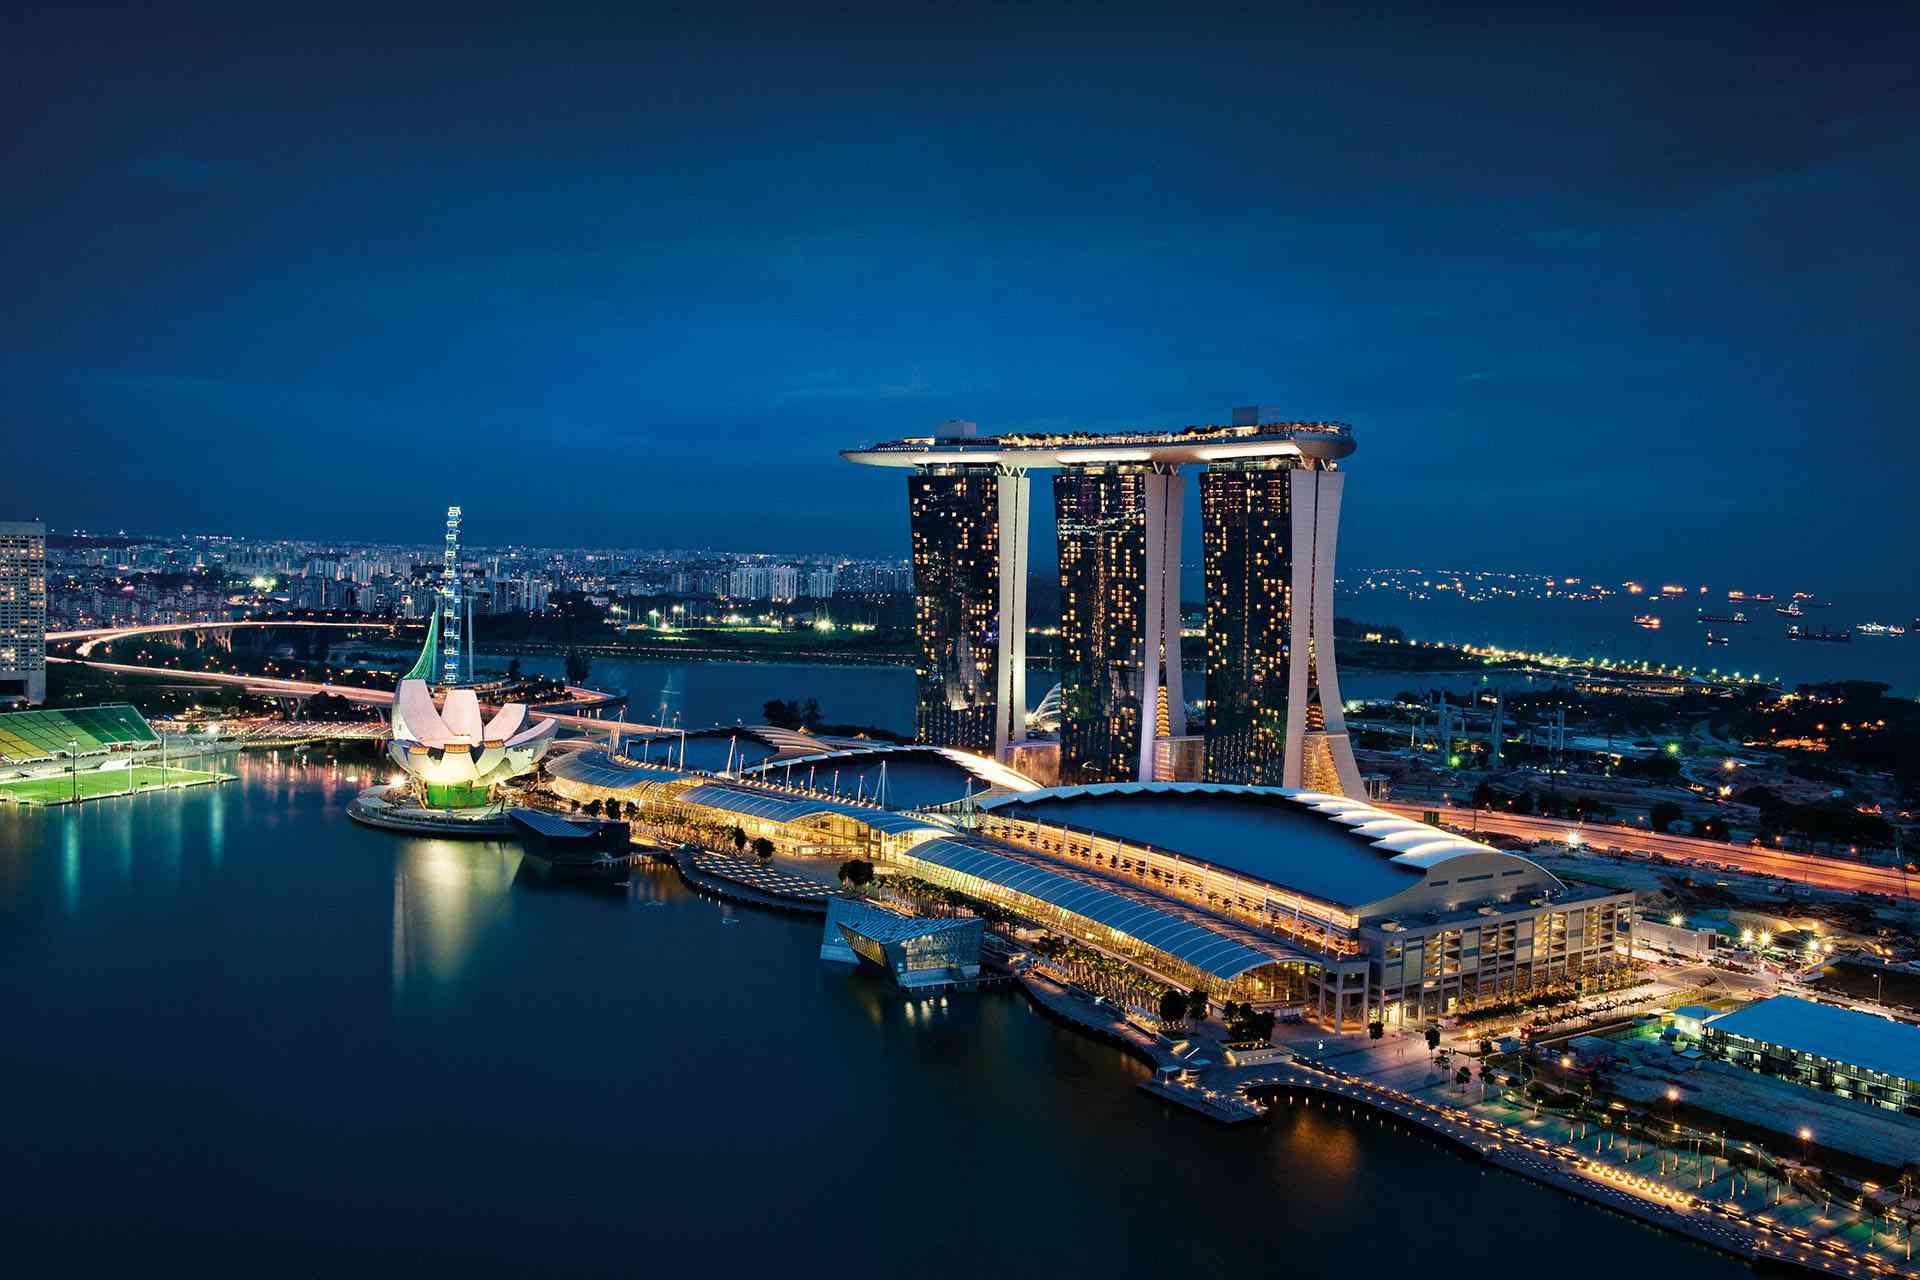 Singapore S Marina Bay Sands